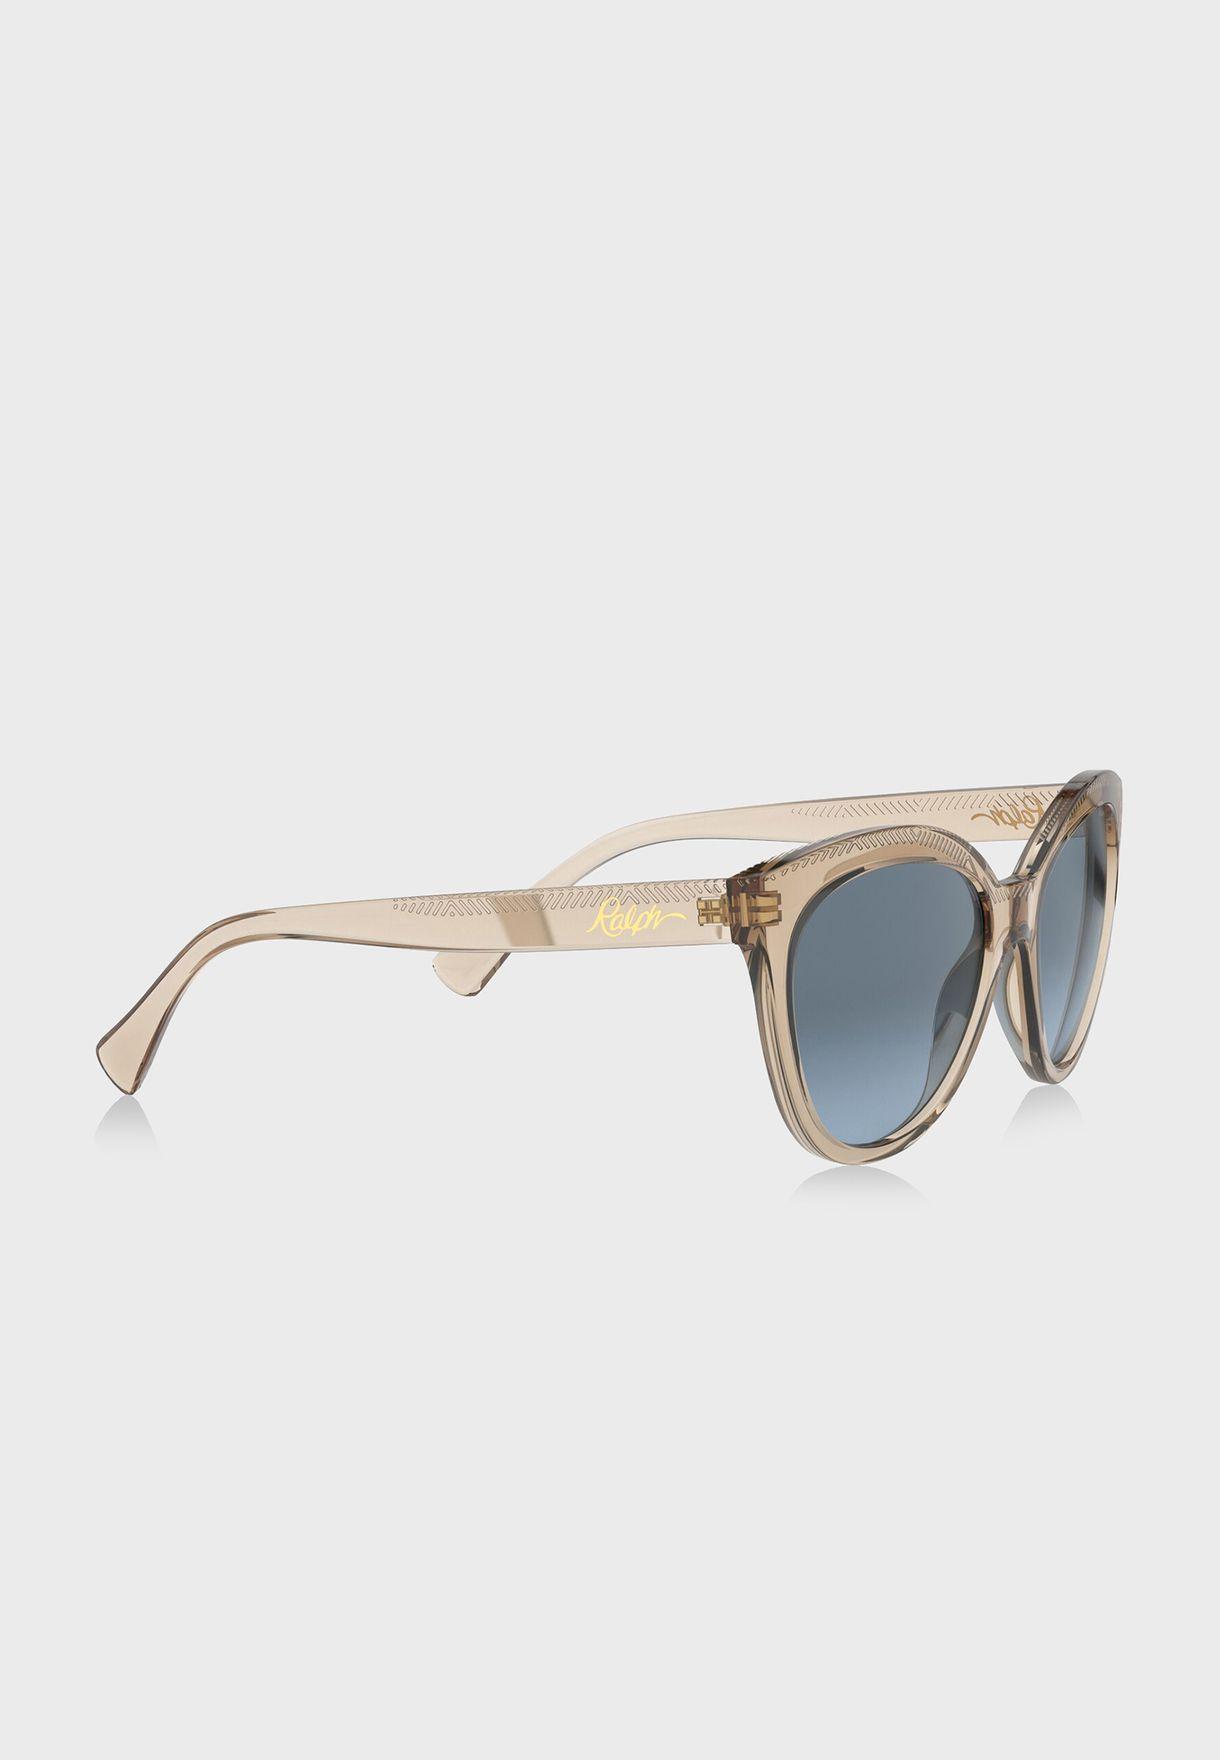 0RA5260 Cat Eye Sunglasses